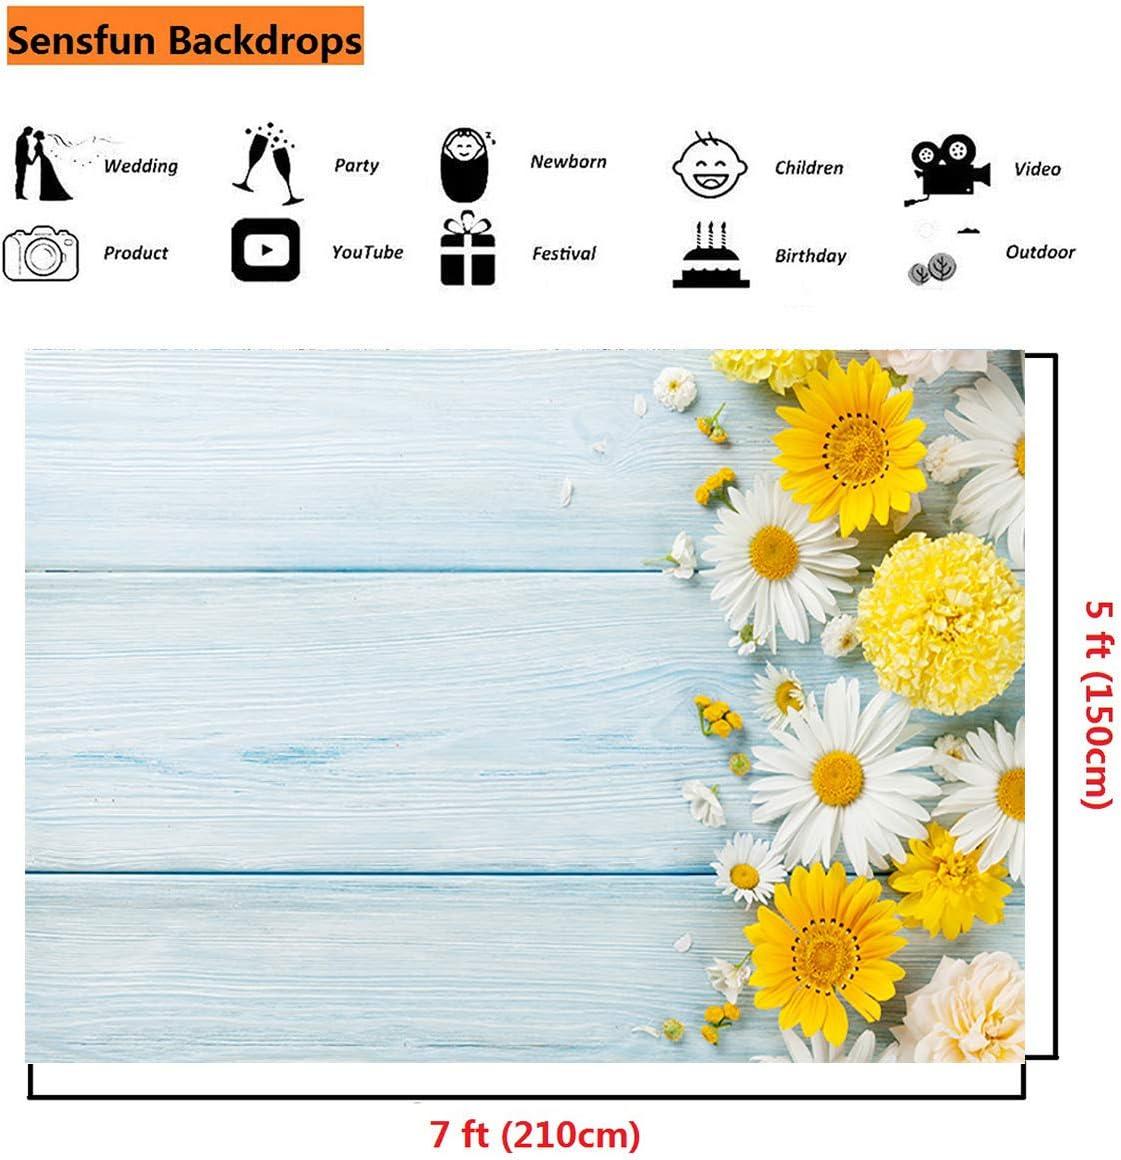 7x7FT Vinyl Photography Backdrop,Indigo,Daisy Like Flowers Photo Background for Photo Booth Studio Props